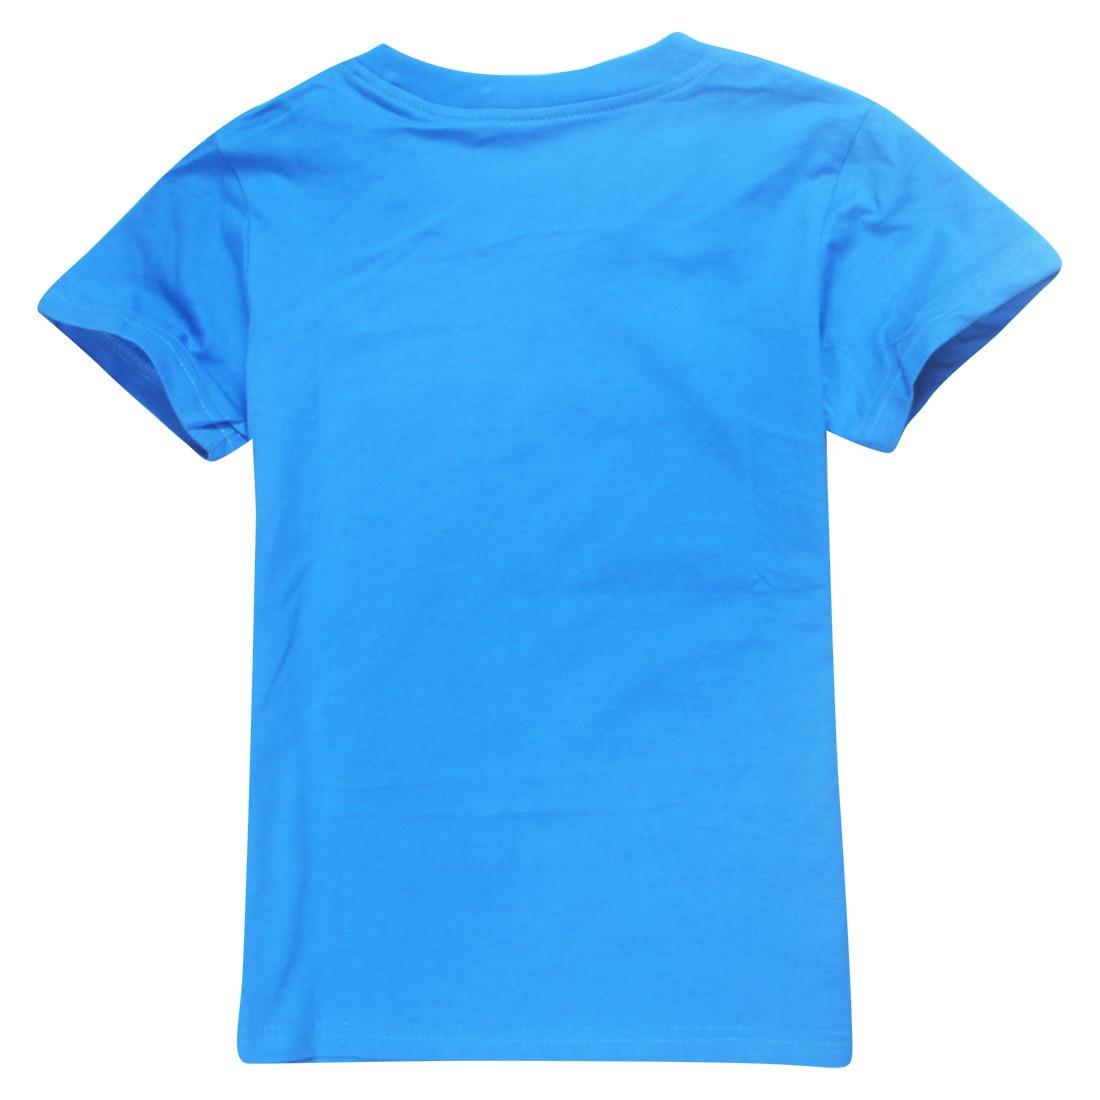 Girl Summer Clothes 2021 Cotton Toddler Girl Clothes Gacha Life Funny Shirt Teen Girls Clothing Baby Boy T-shirt Big Kids Tees 5